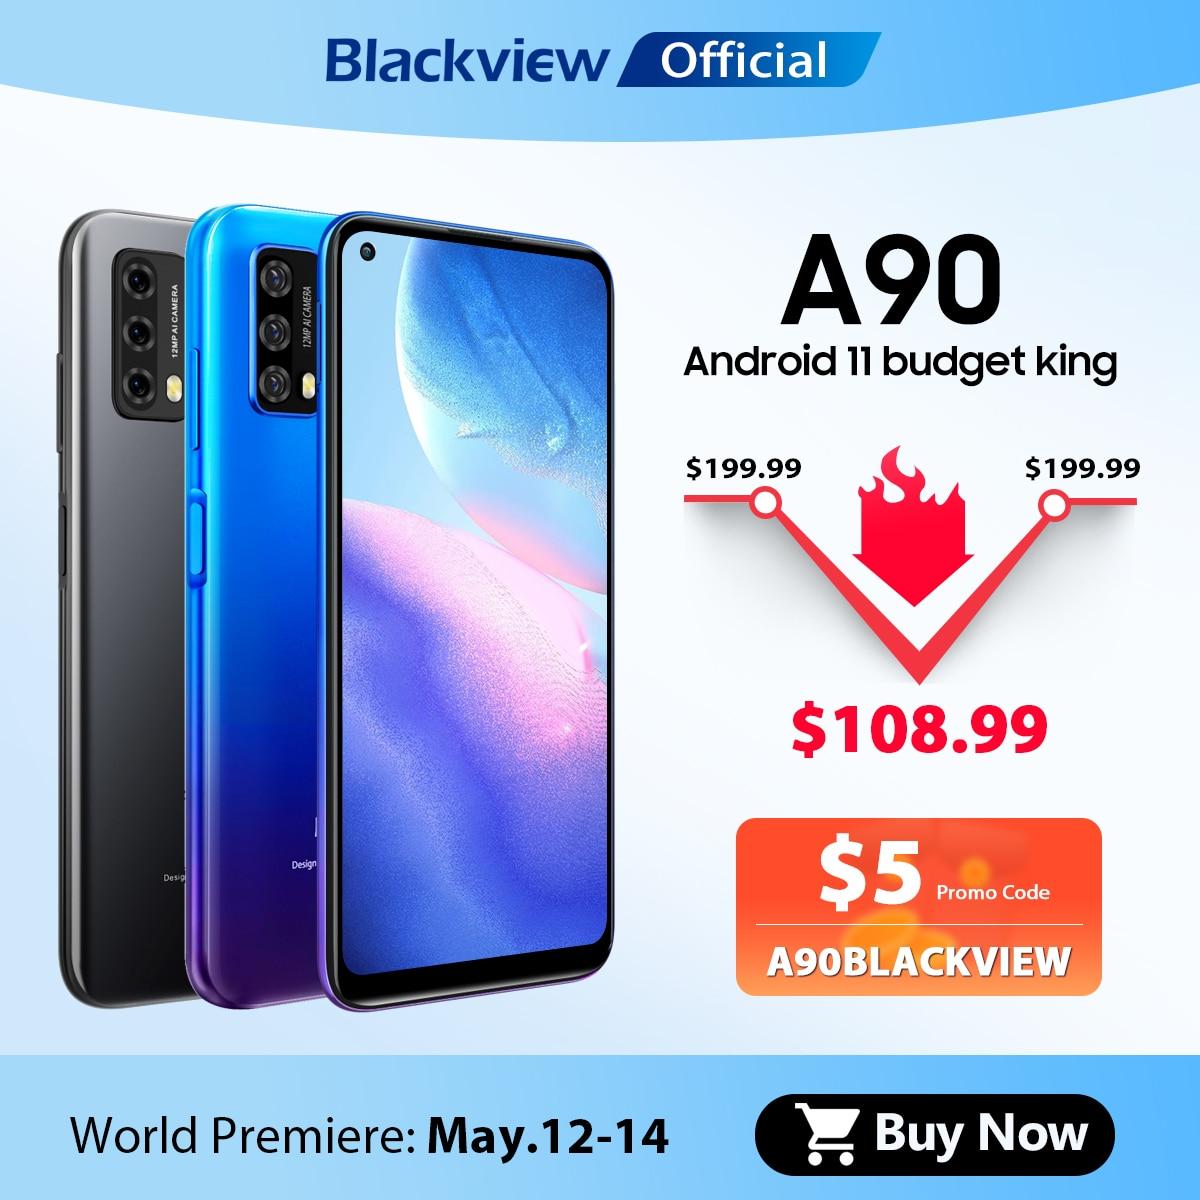 Blackview A90 смартфон Helio P60 Octa Core 12MP HDR Камера мобильный телефон 4 Гб + 64 Гб 4280 мАч Android 11 Телефон 4 аппарат не привязан к оператору сотовой связи Чехо...